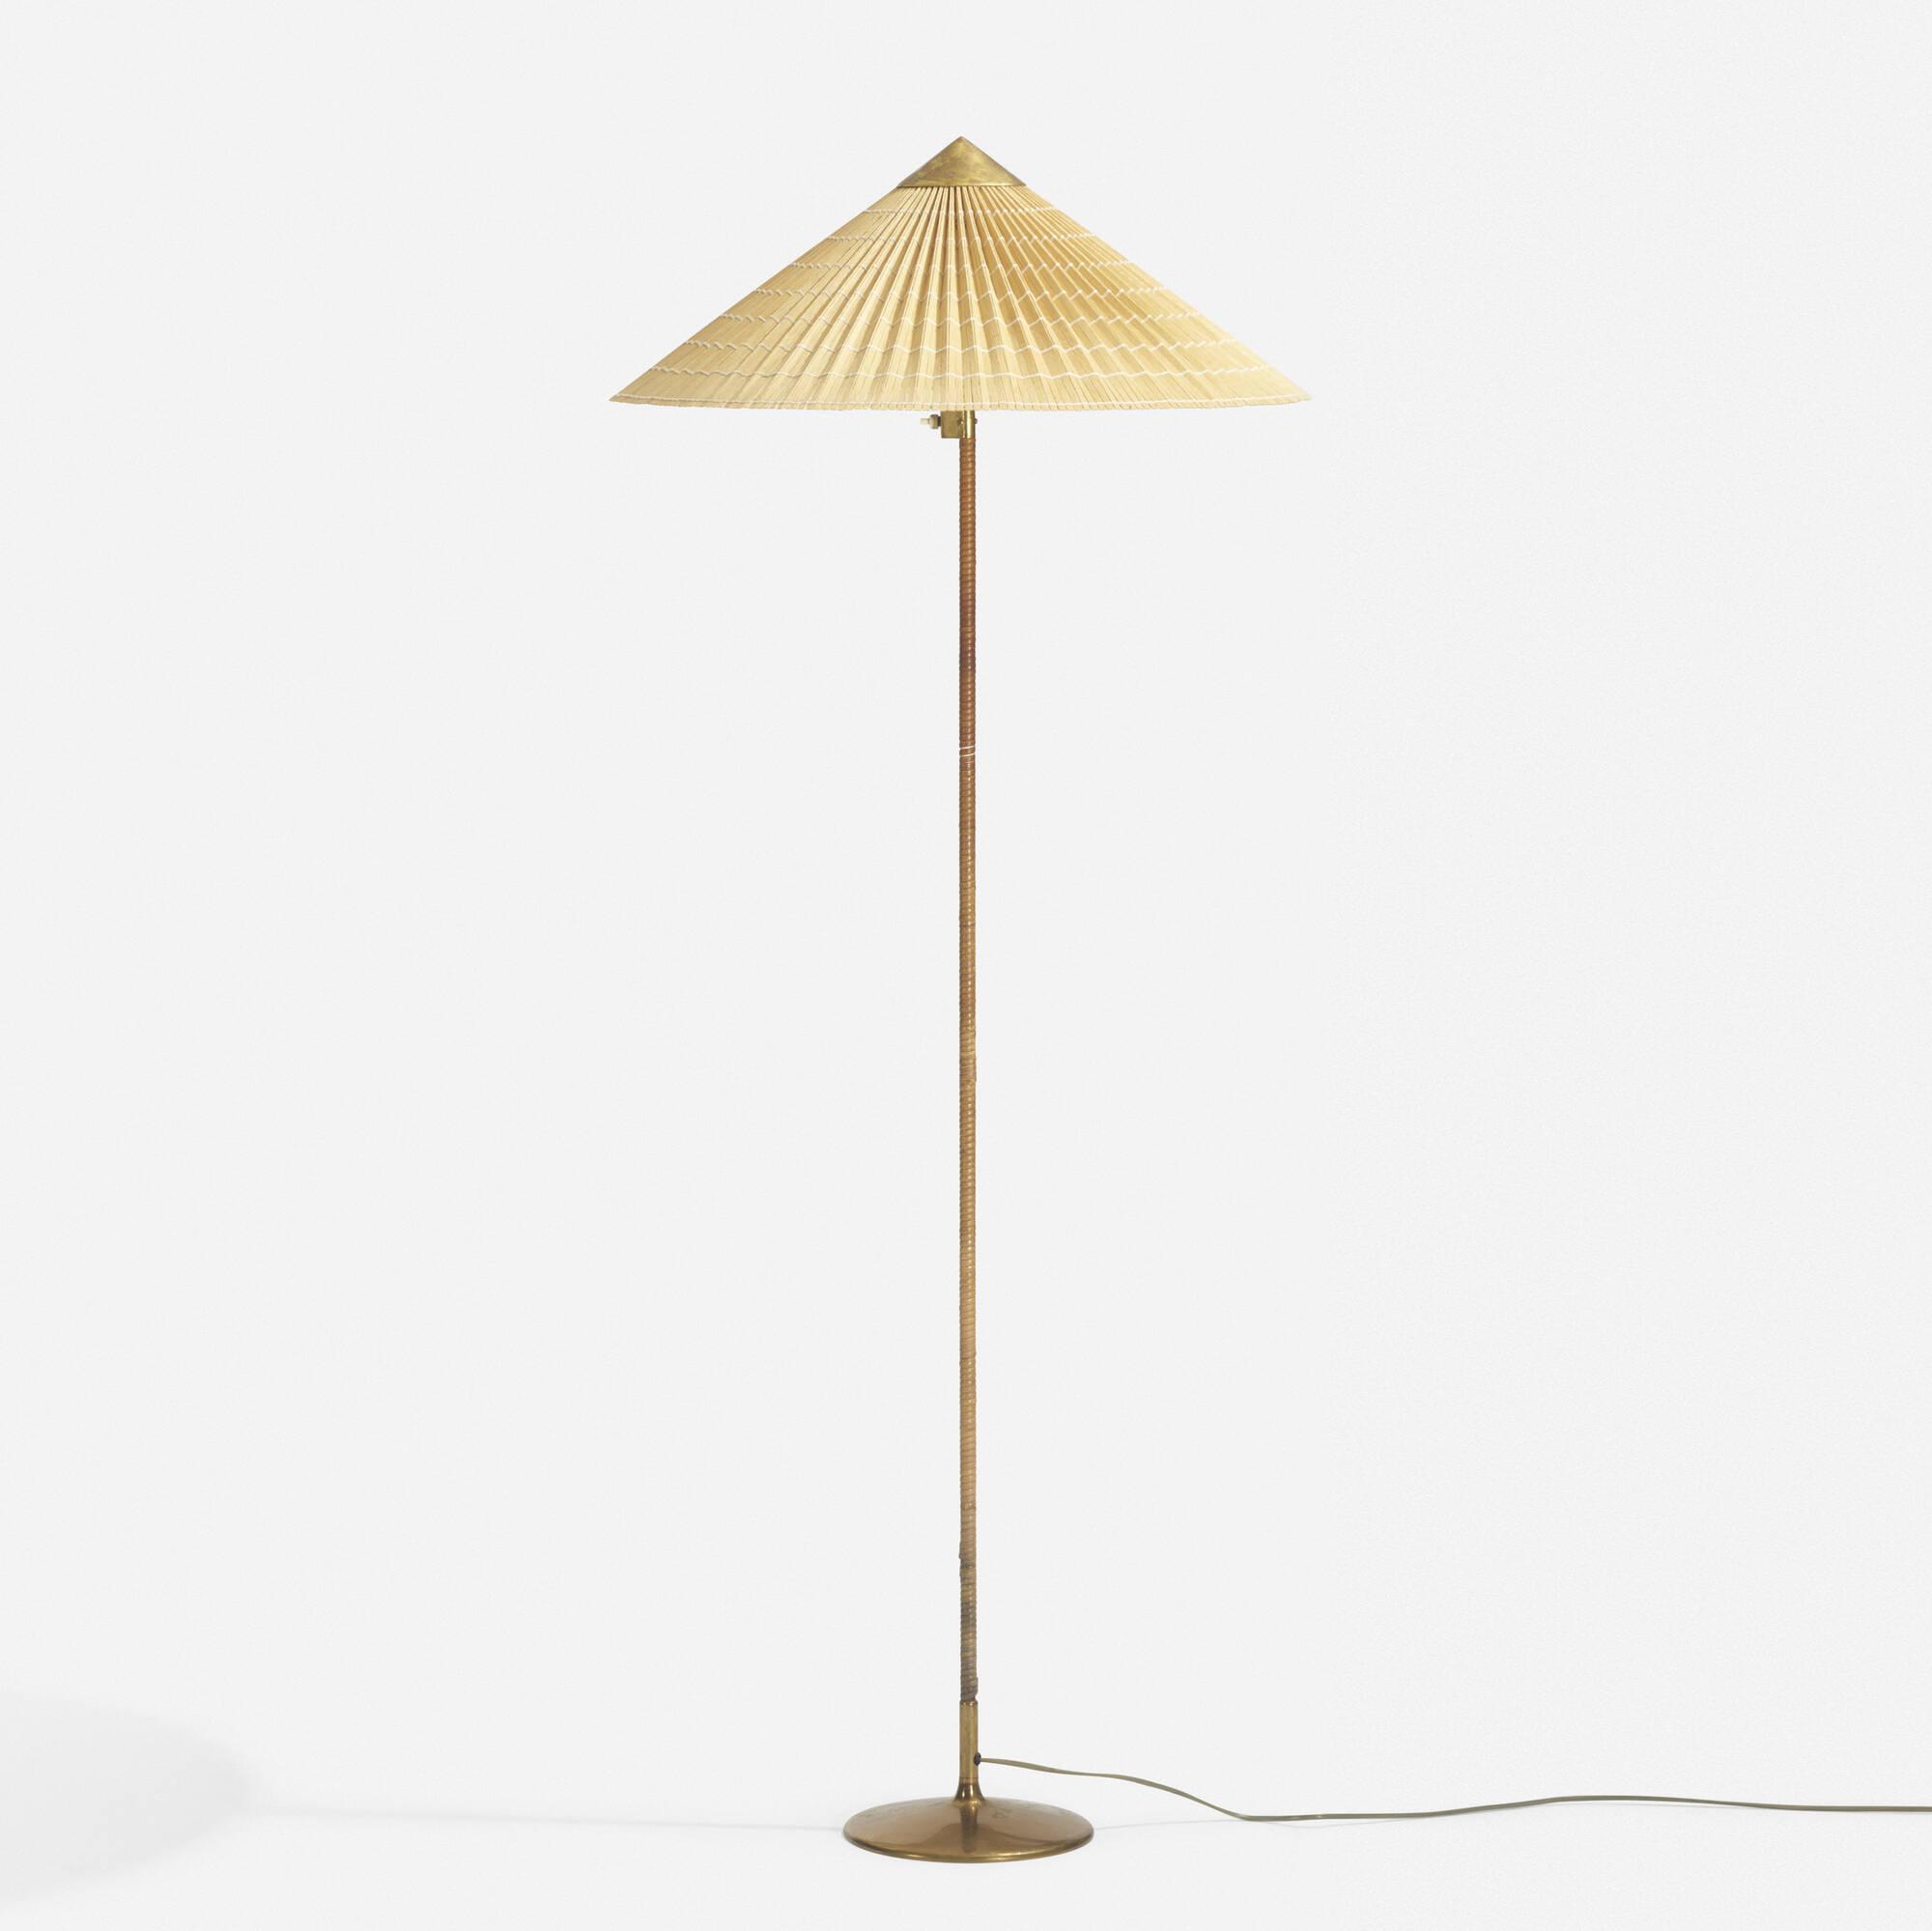 193: Paavo Tynell / floor lamp (1 of 2)